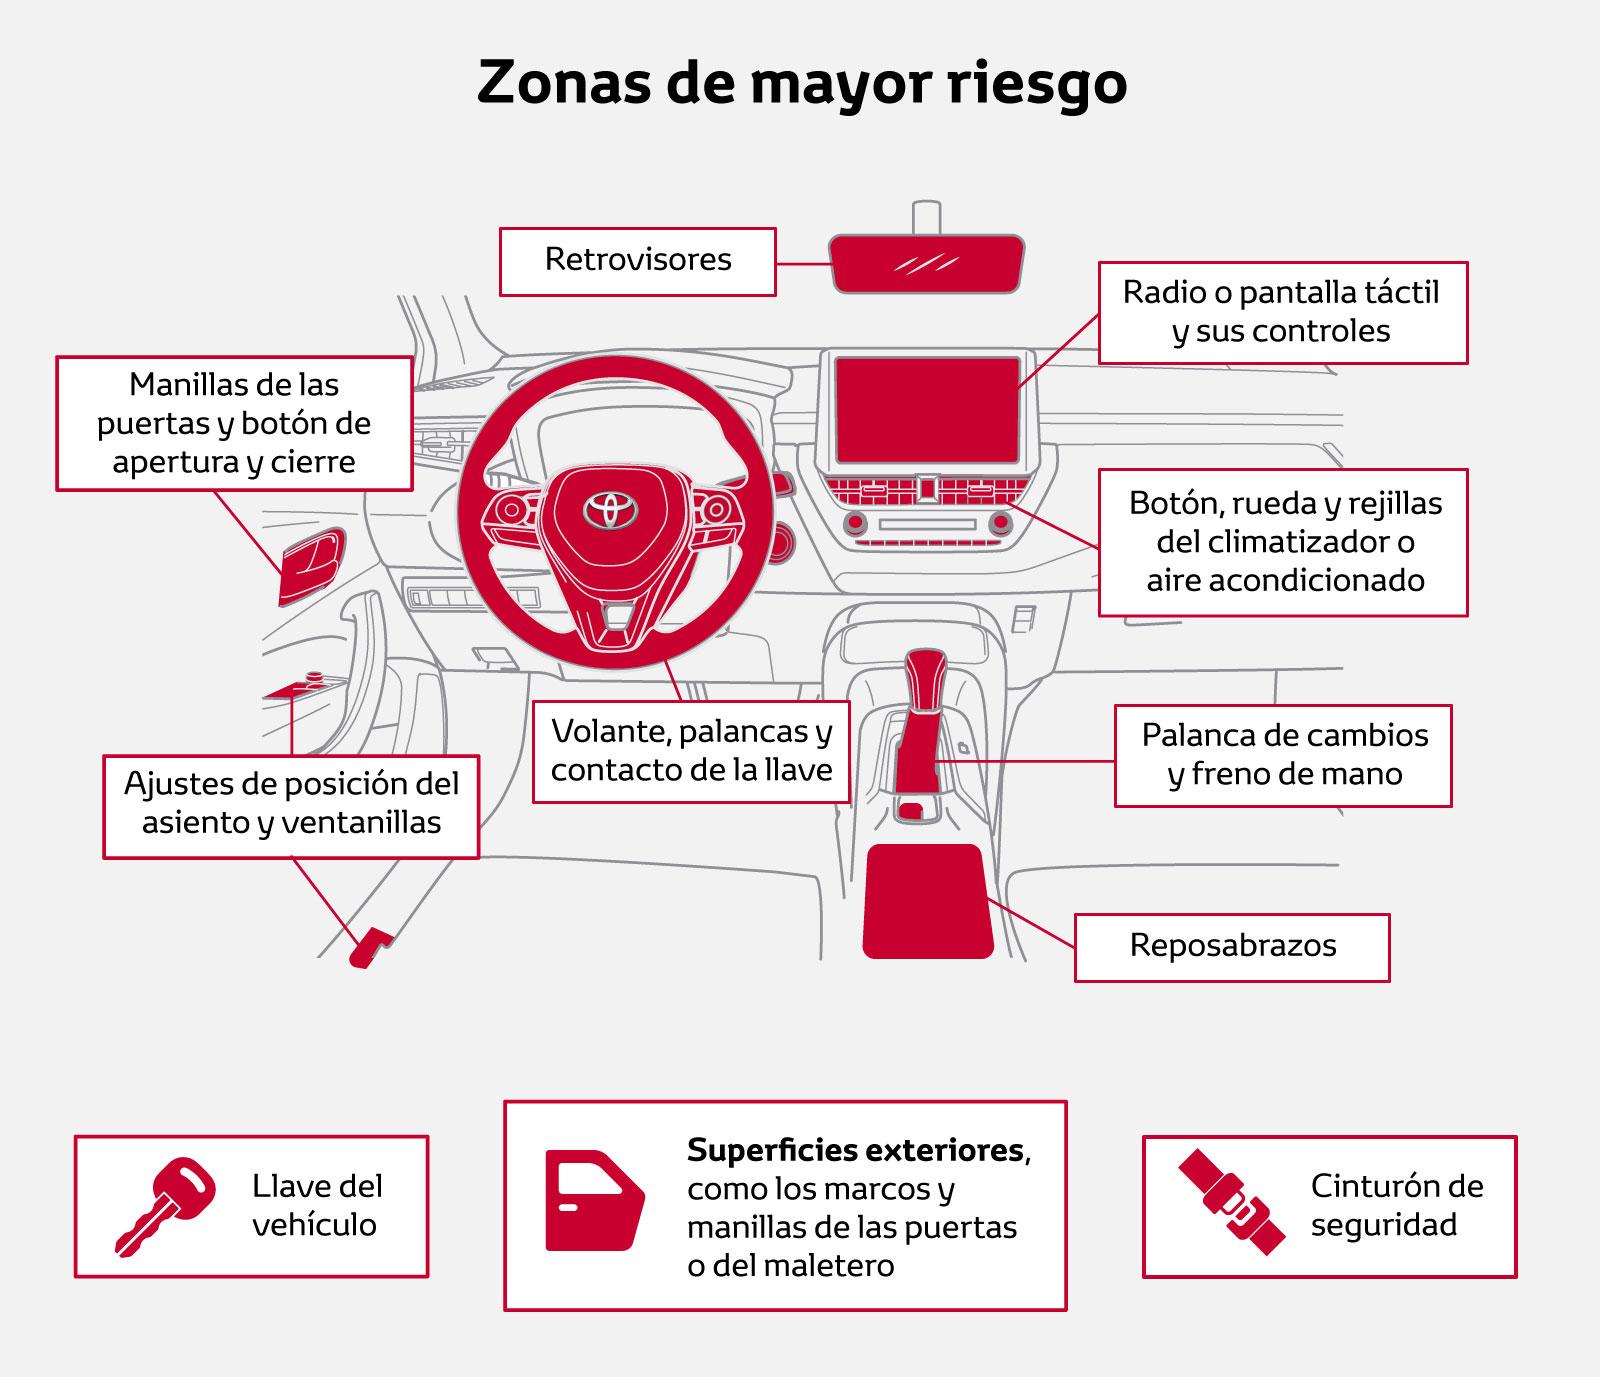 desinfectar interior del coche por coronavirus